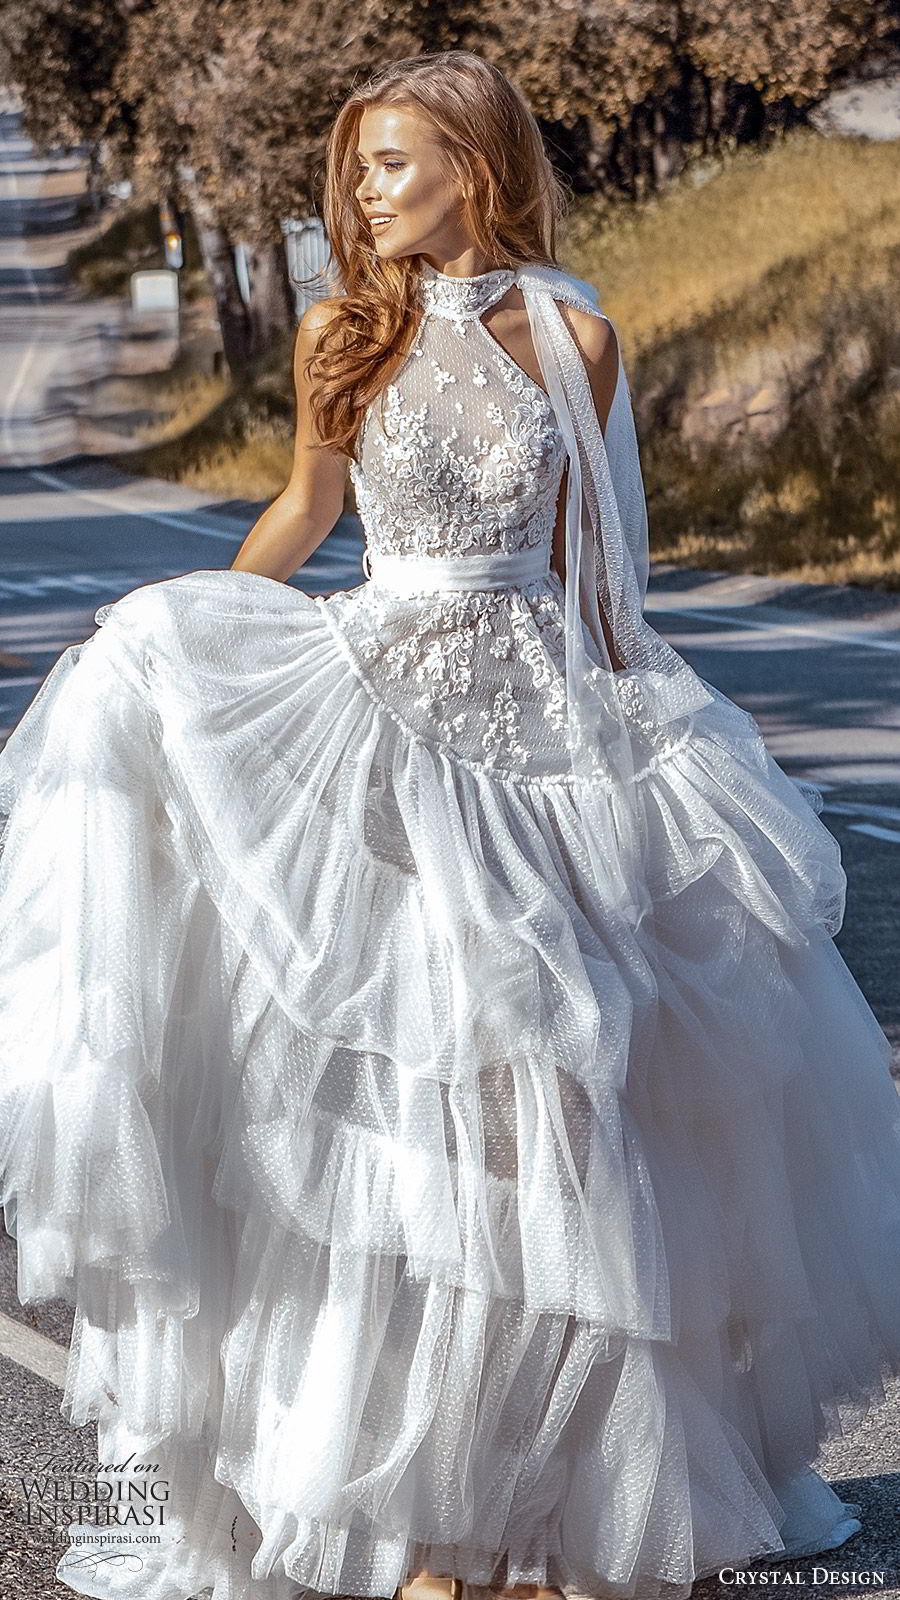 crystal design 2020 couture bridal sleeveless halter neck lace bodice drop waist ball gown wedding dress (6) romantic boho chic chapel train mv